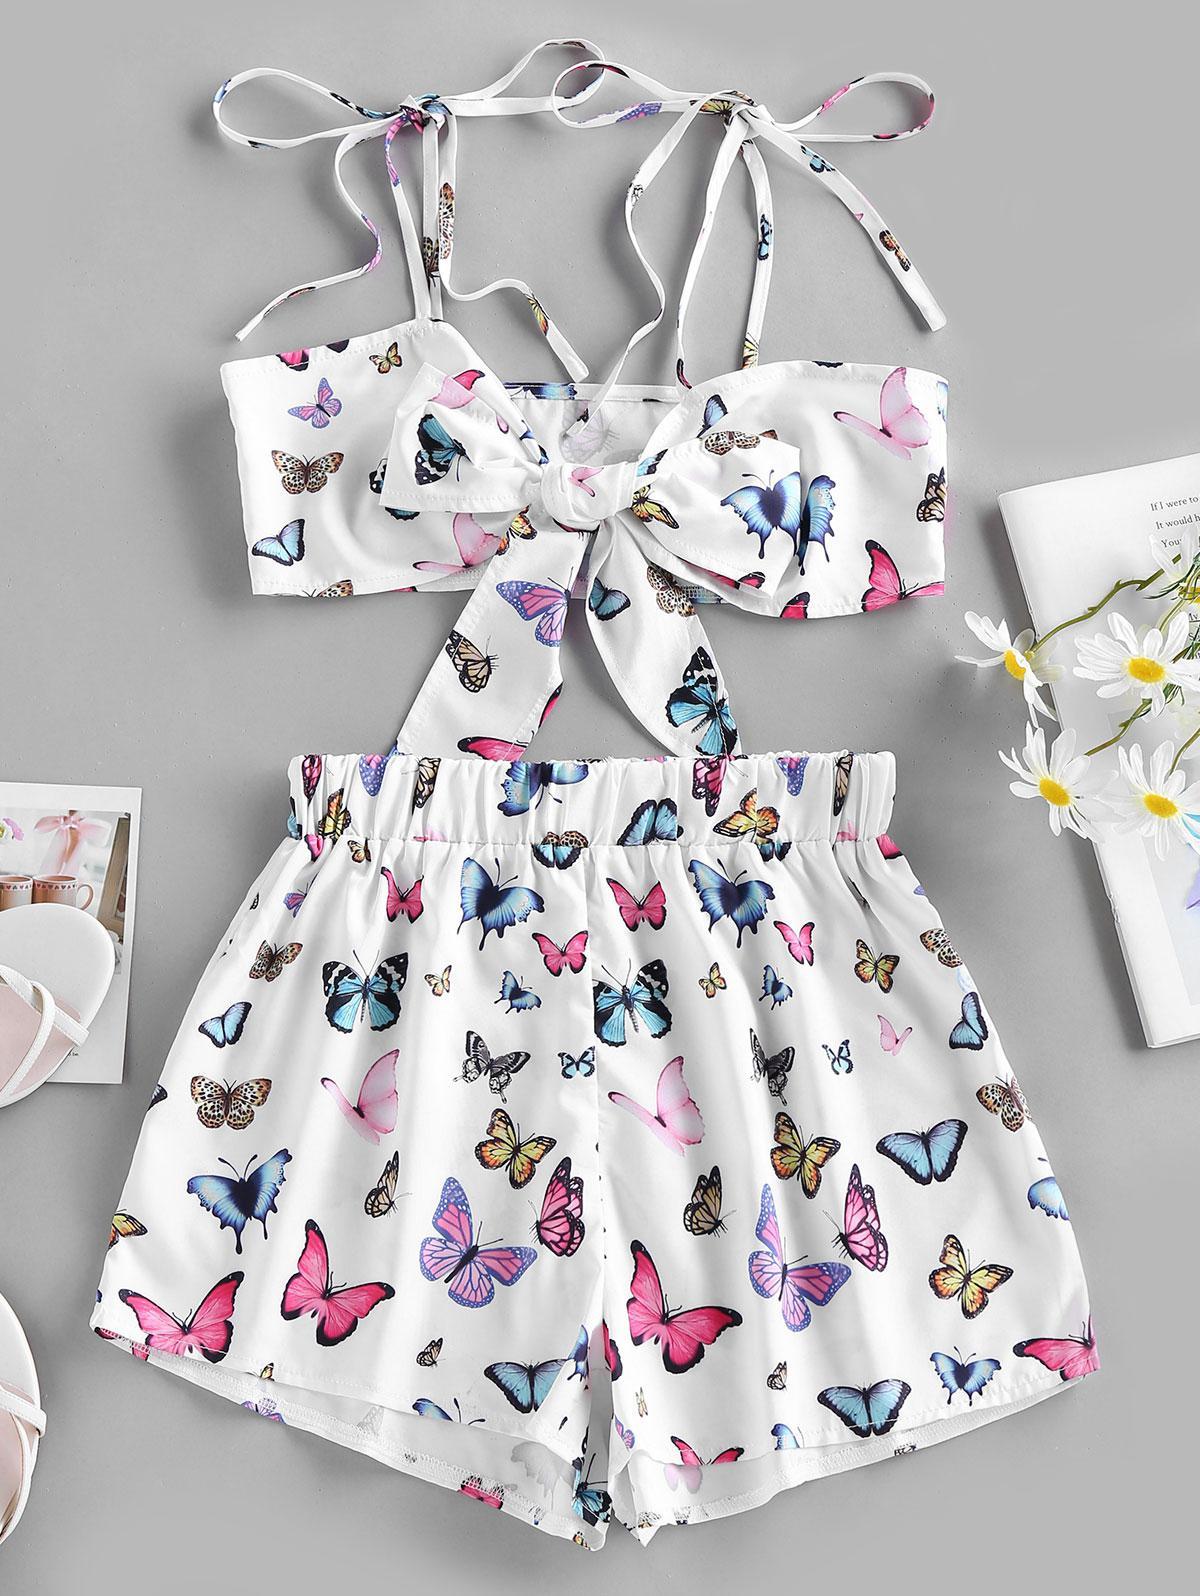 ZAFUL Self Tie Butterfly Print Bowknot Shorts Set